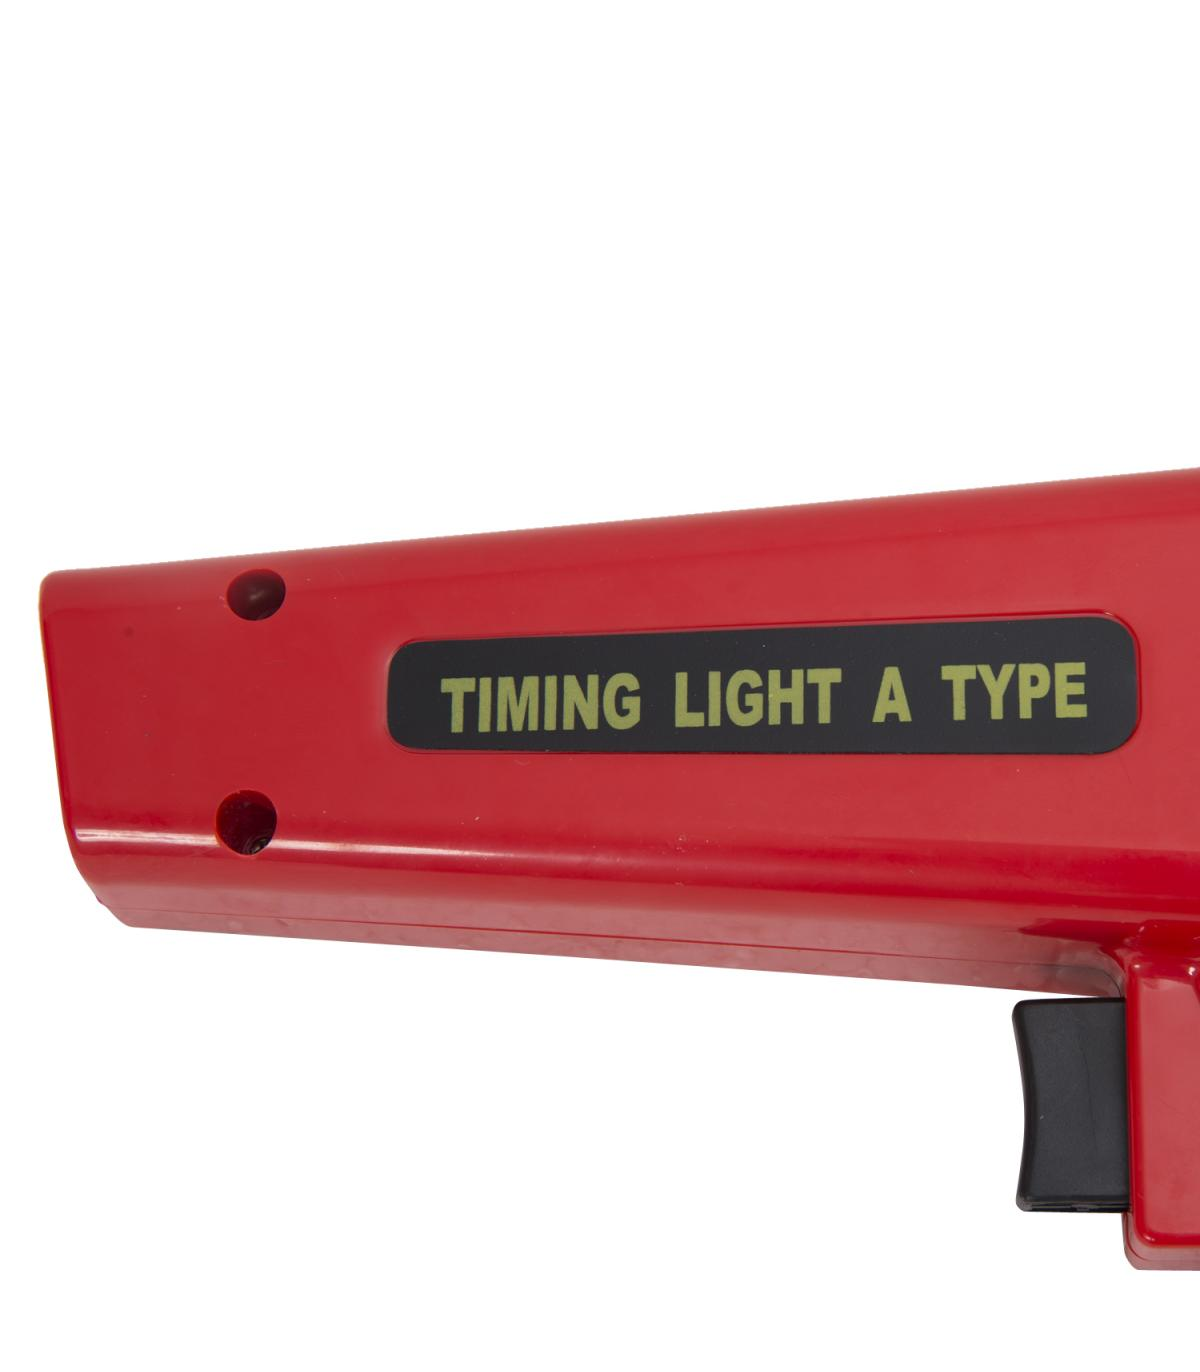 HOMCOM Pistola Estroboscopica 12V Motor Gasolina Lampara Xenon Punto De Encendido Color Rojo/…